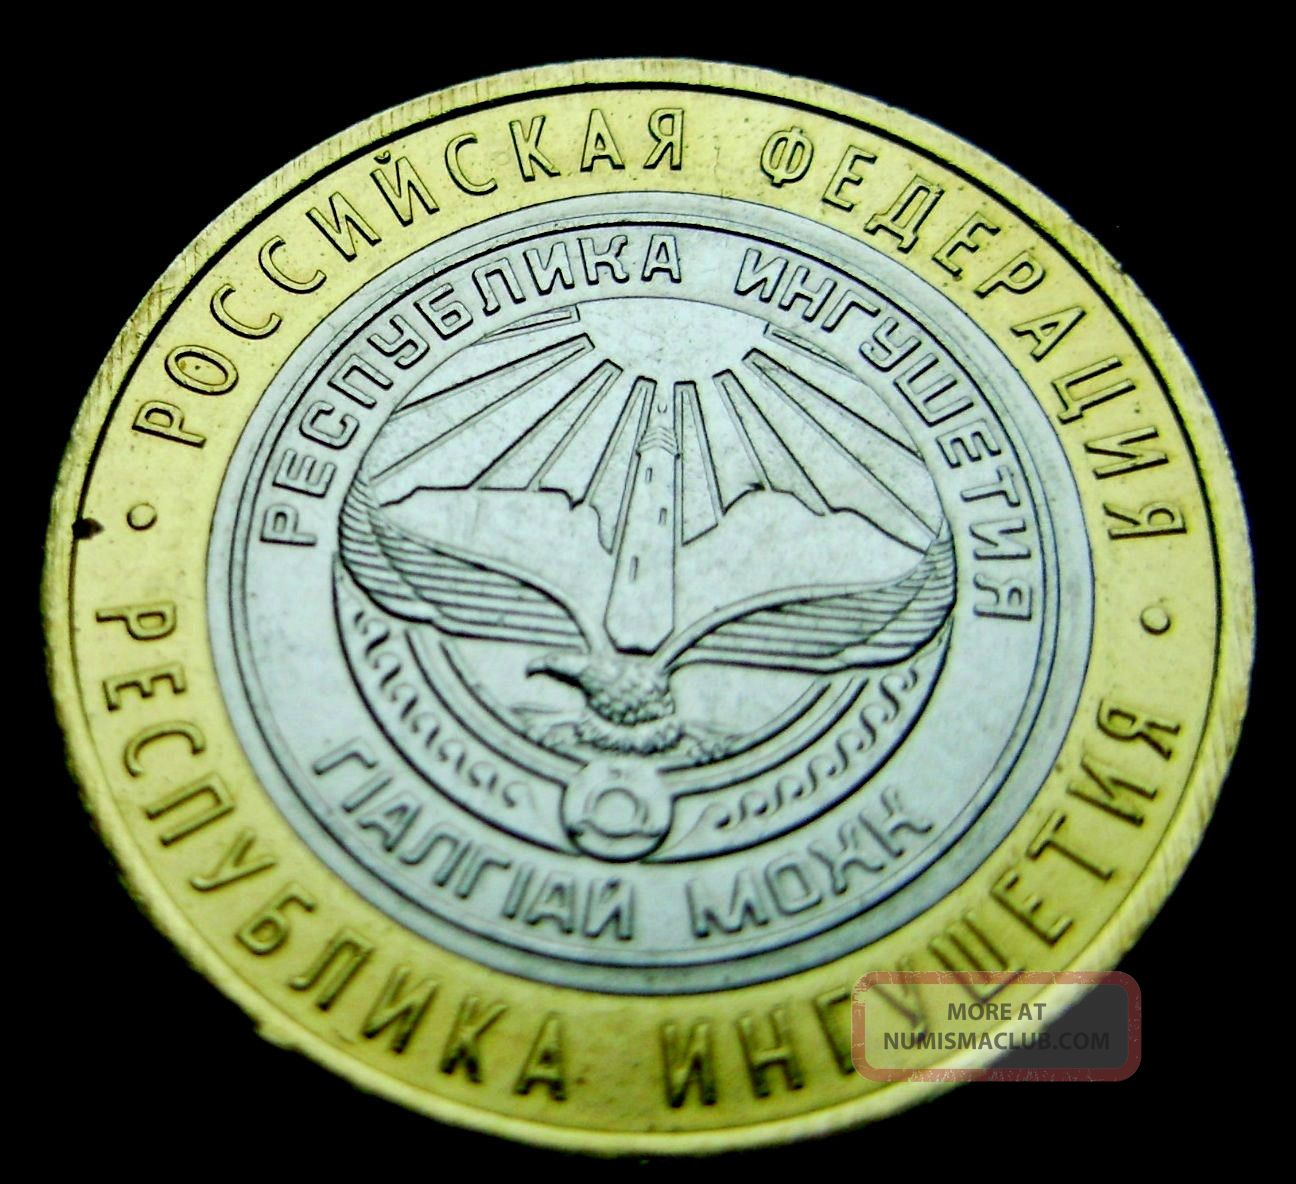 Russia.  10 Roubles 2014 - Ingushetiya Republic Arms.  Bi - Metallic Russia photo